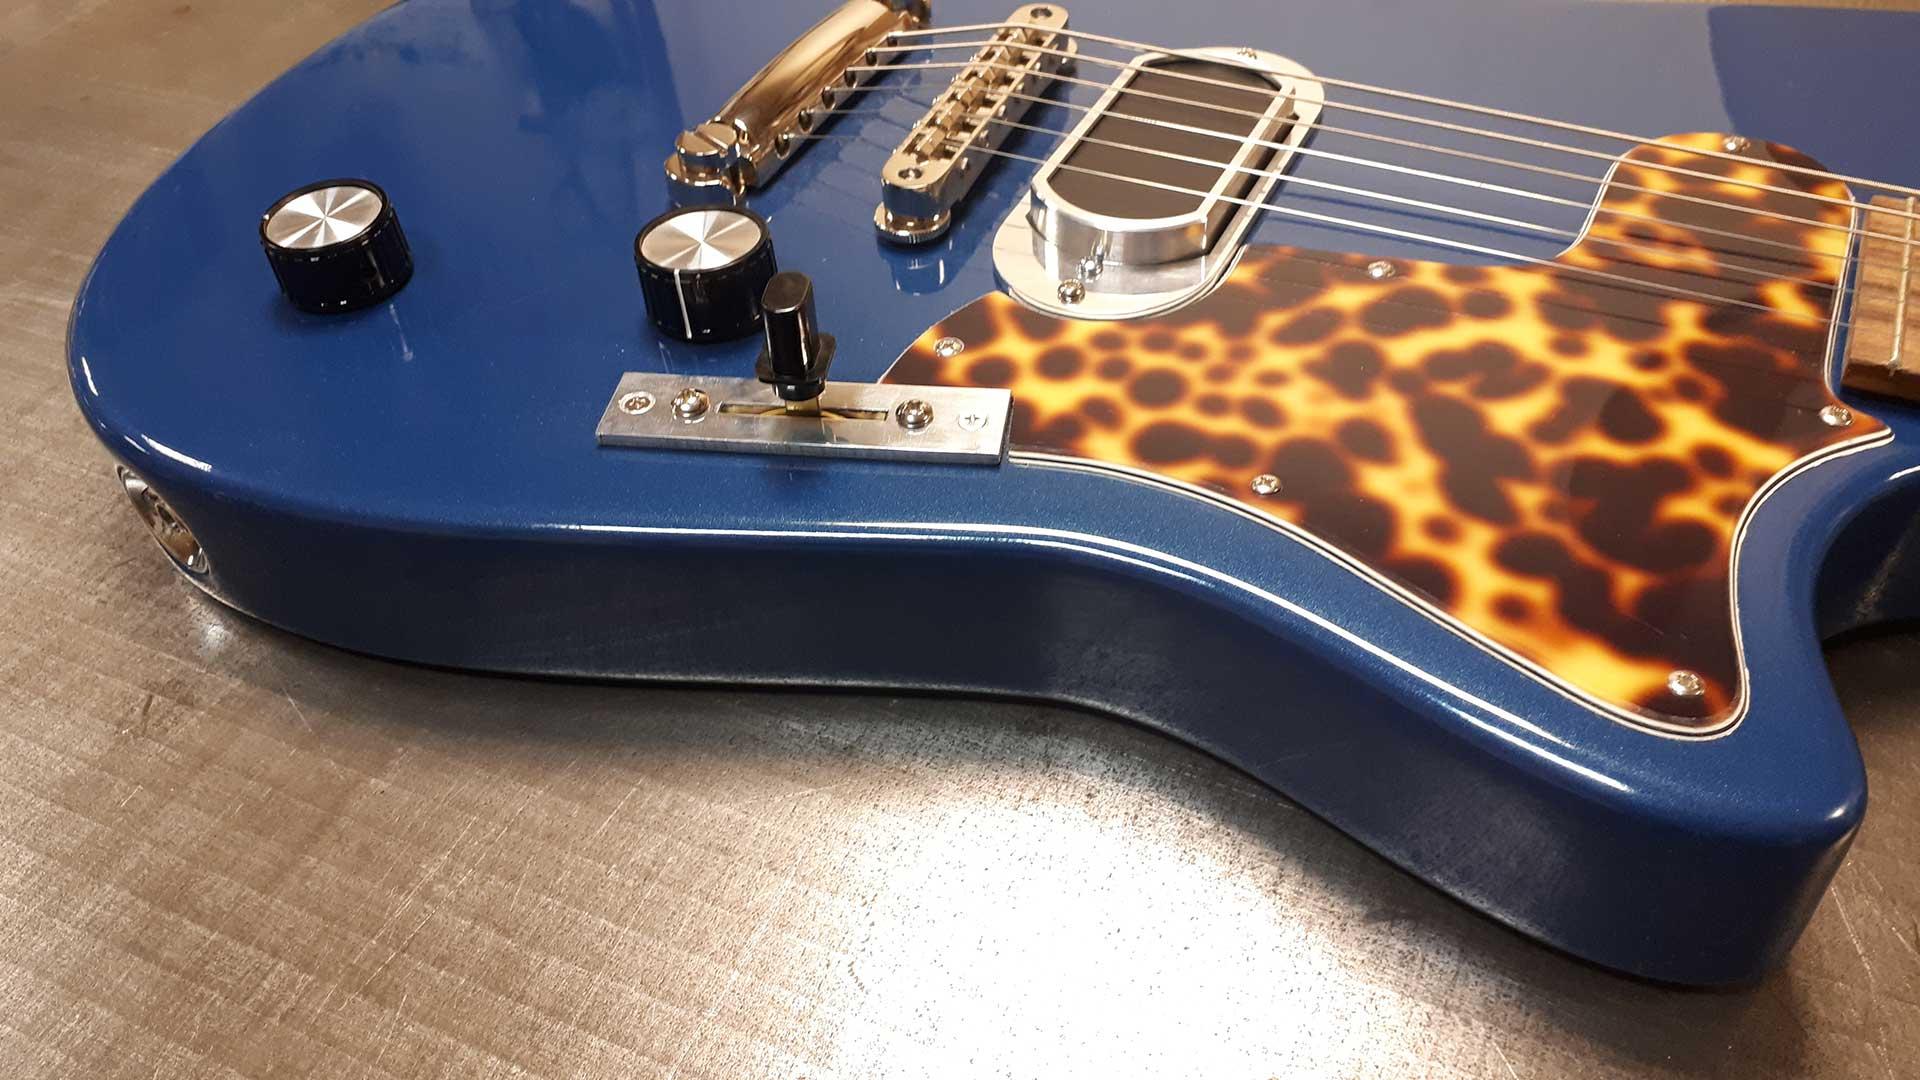 https://www.roadrunnerguitars.com/wp-content/uploads/2020/01/roadrunner-contour-blue-saphir-detail-1.jpg